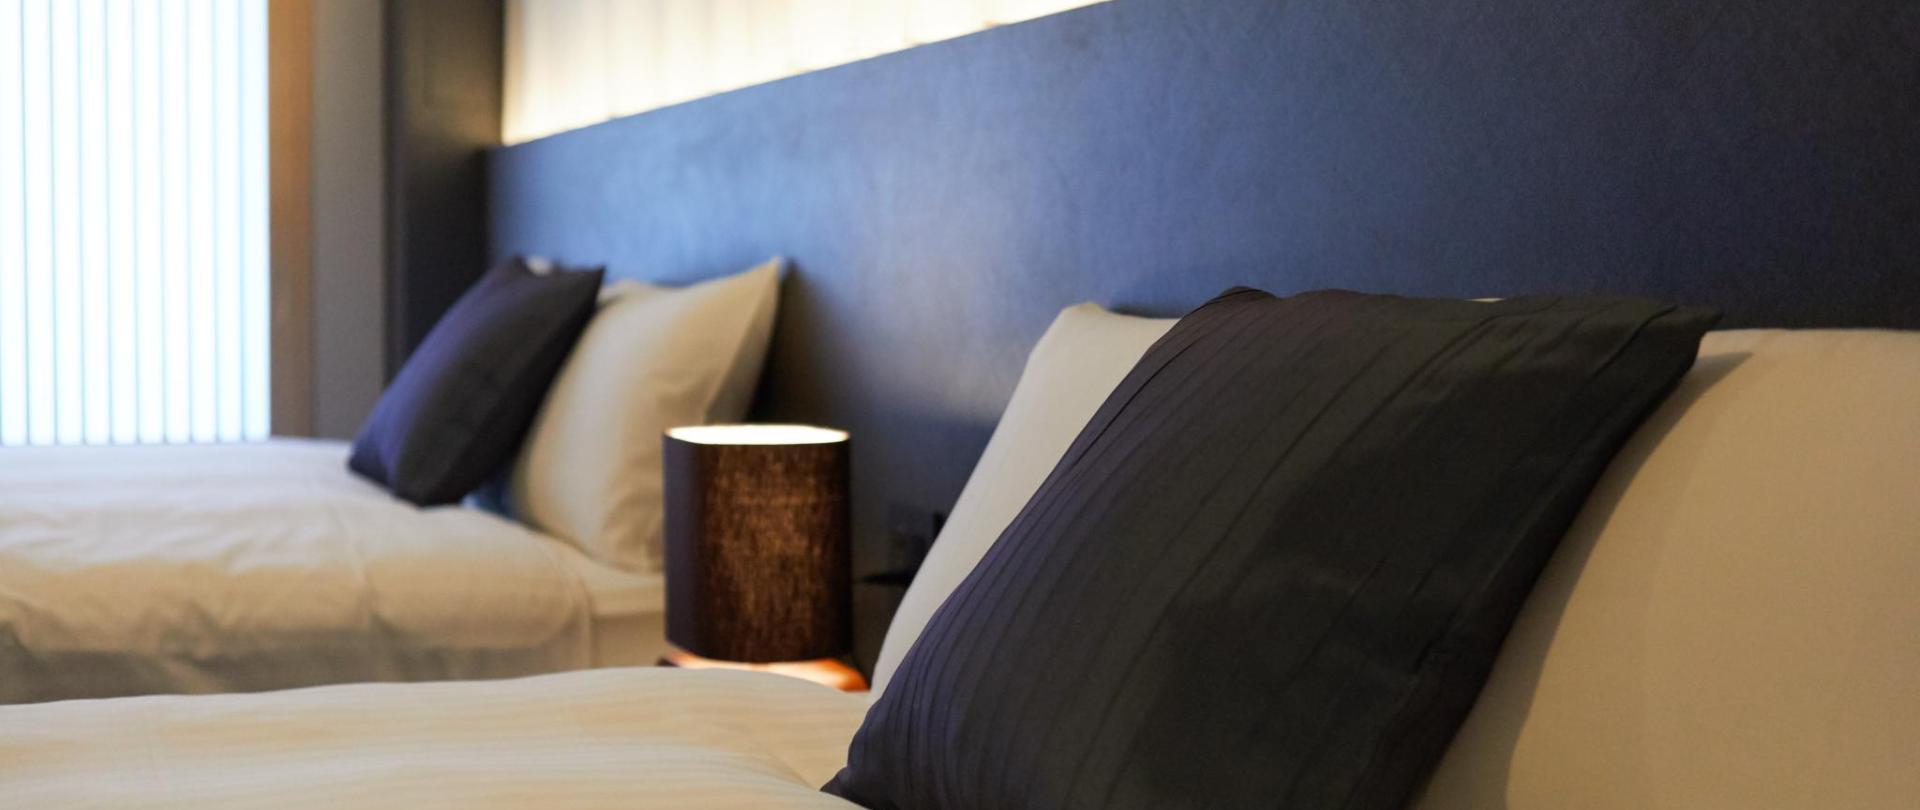 181217_HotelMondonce_159.jpg